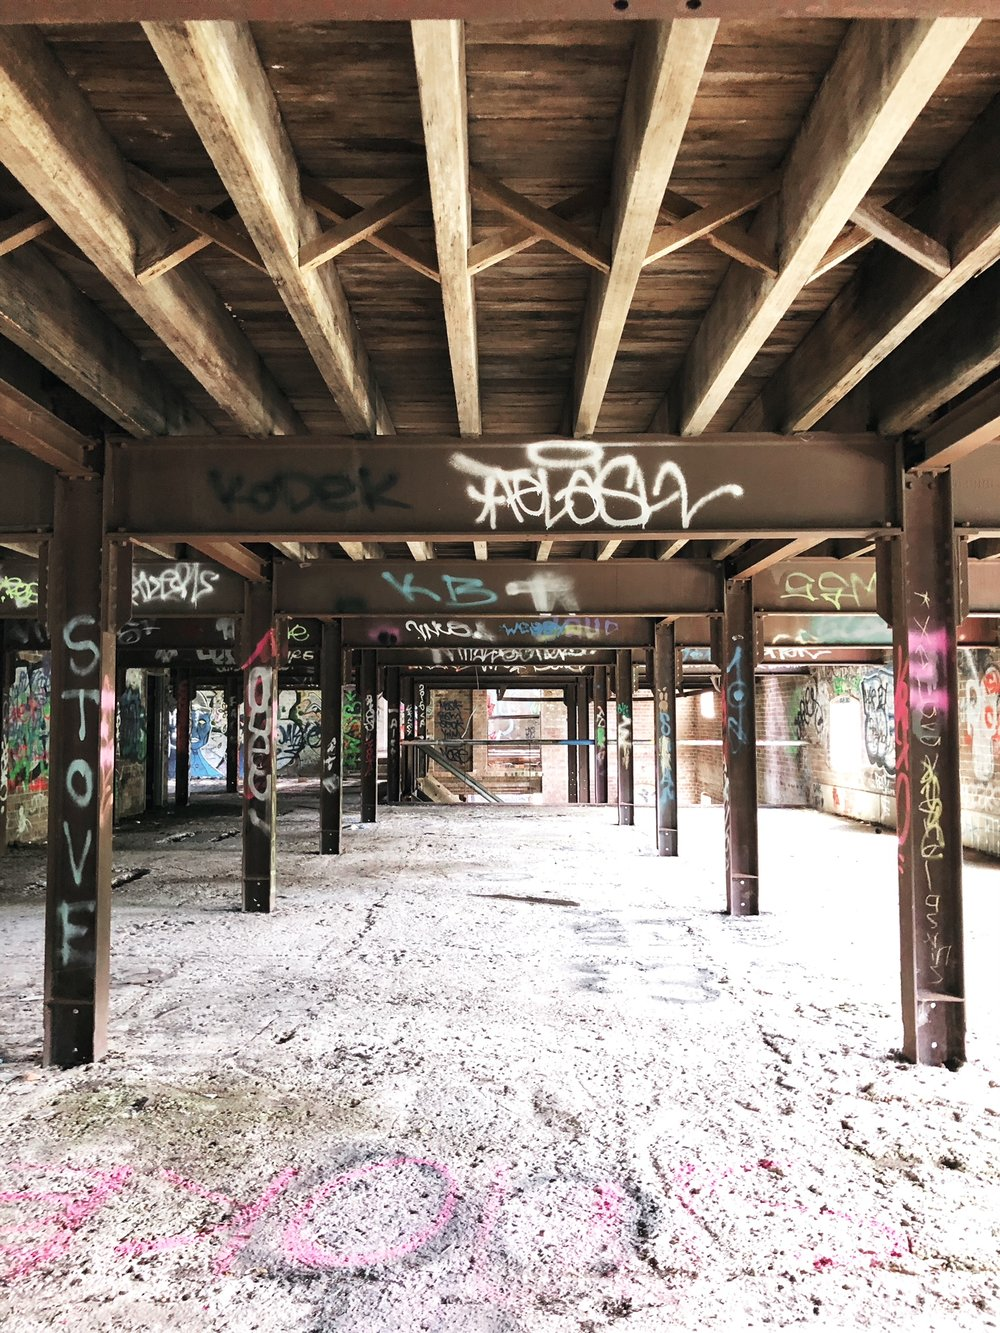 Urbanex frames